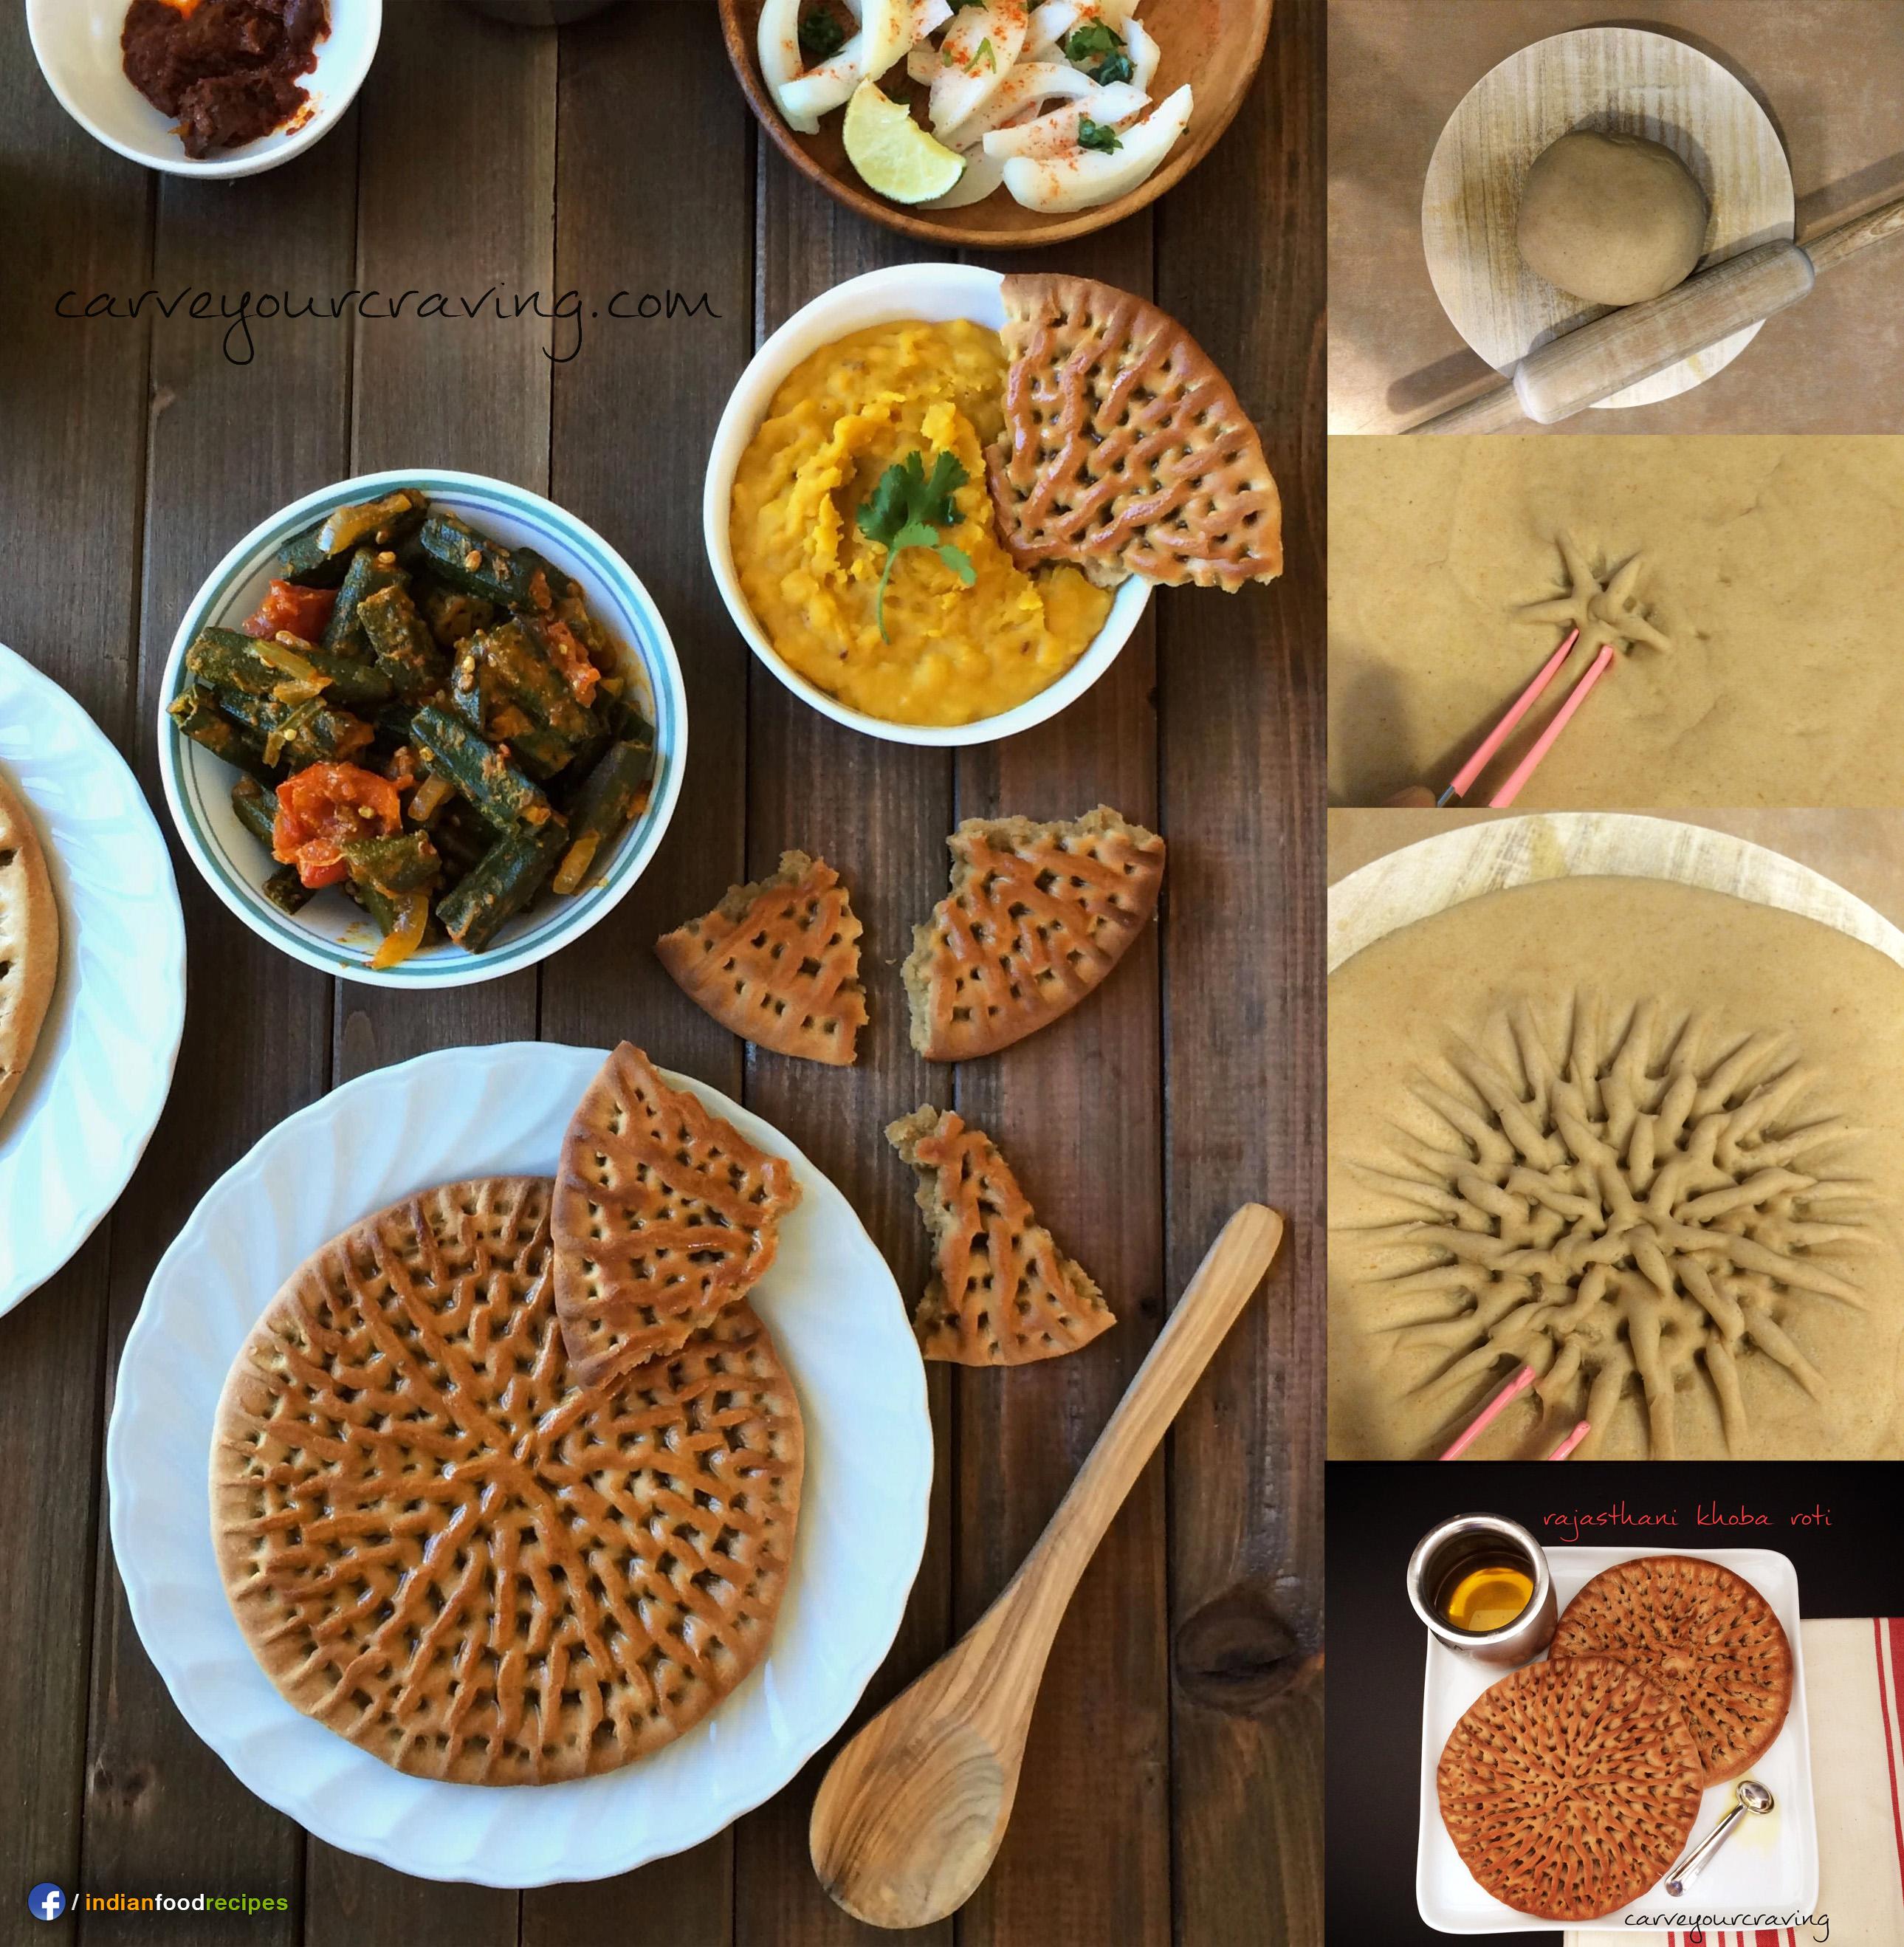 Rajasthani Khoba Roti recipe step by step